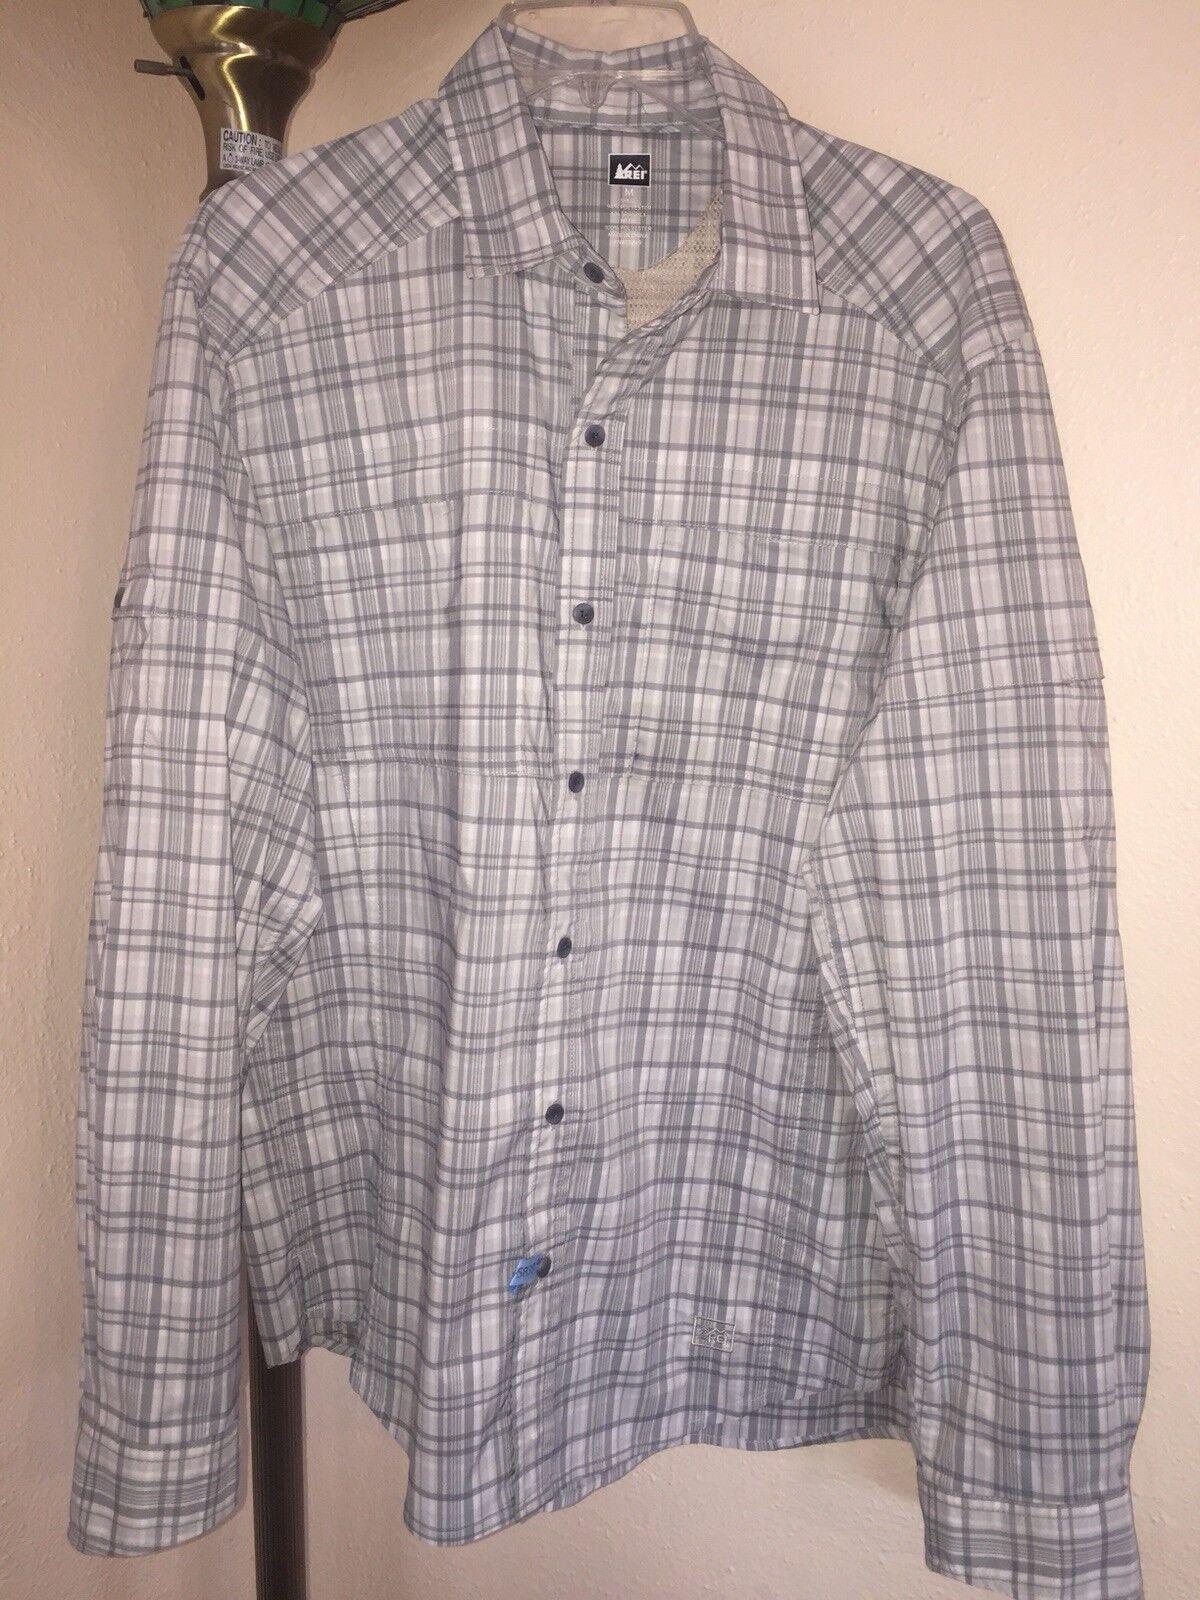 Men's  REI Co-Op Sahara Tech Plaid L S Vented Fishing Hiking Travel Shirt Sz Med  low-key luxury connotation